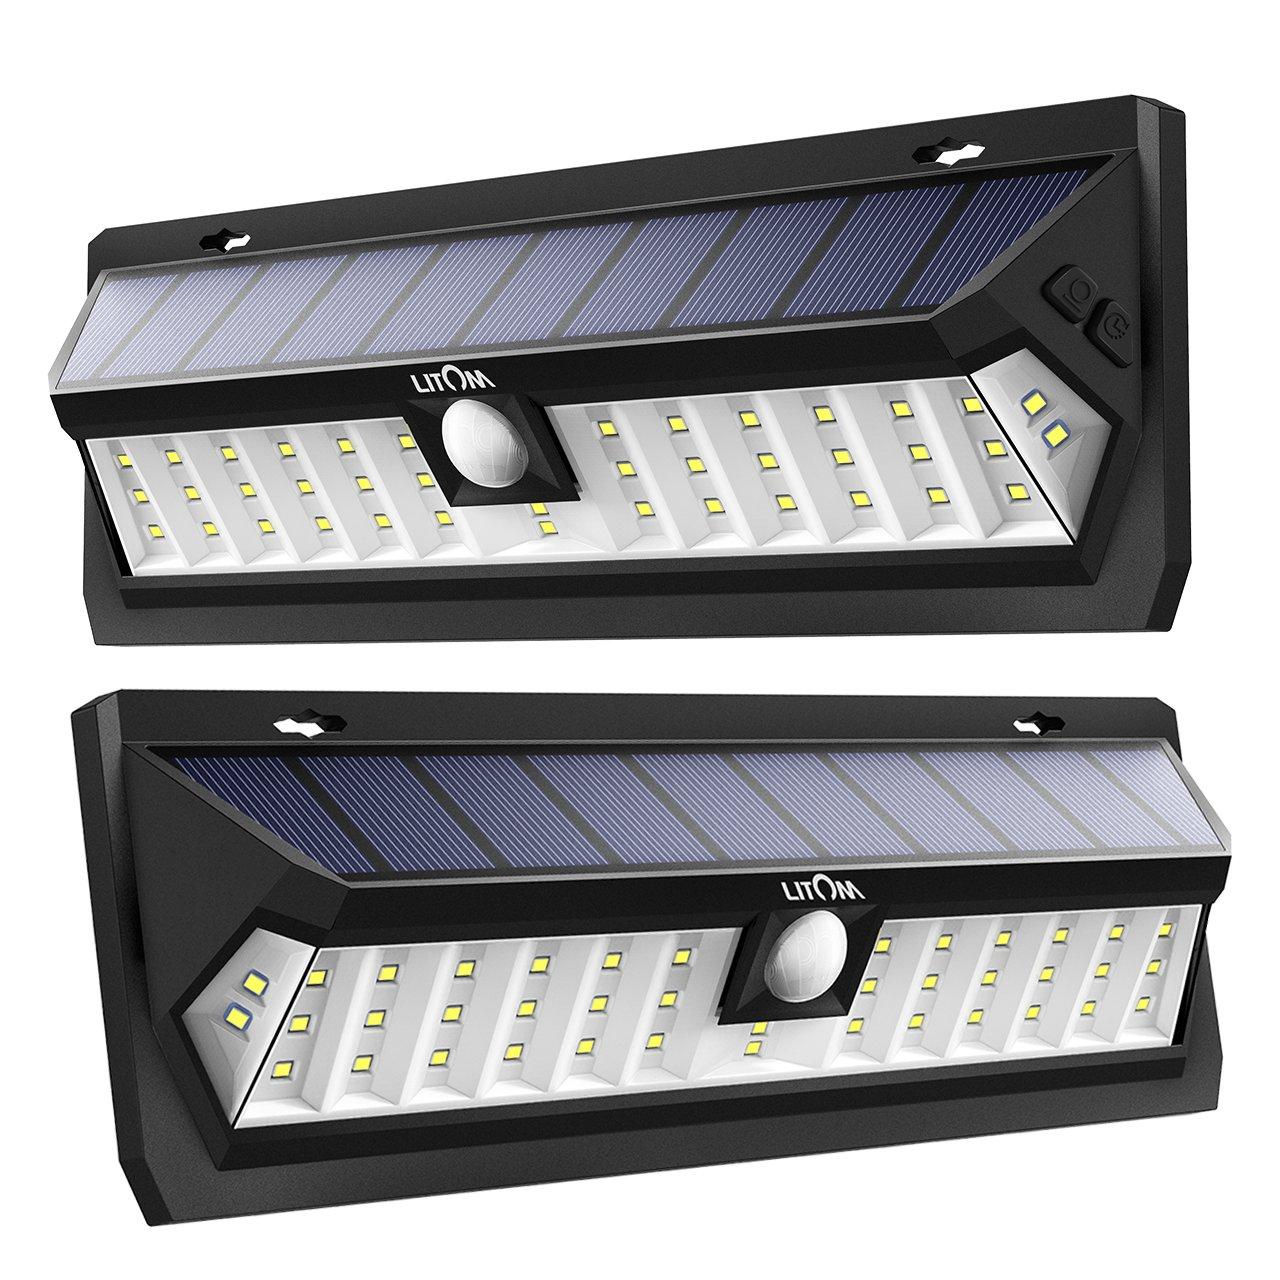 LITOM Solar Lights Outdoor 42 LED, Adjustable Lighting Time Solar Motion Sensor Light with 270° Wide Angle and Waterproof Design, Wireless Solar Lighting for Front Door, Yard, Garage, Deck (2 Pack)